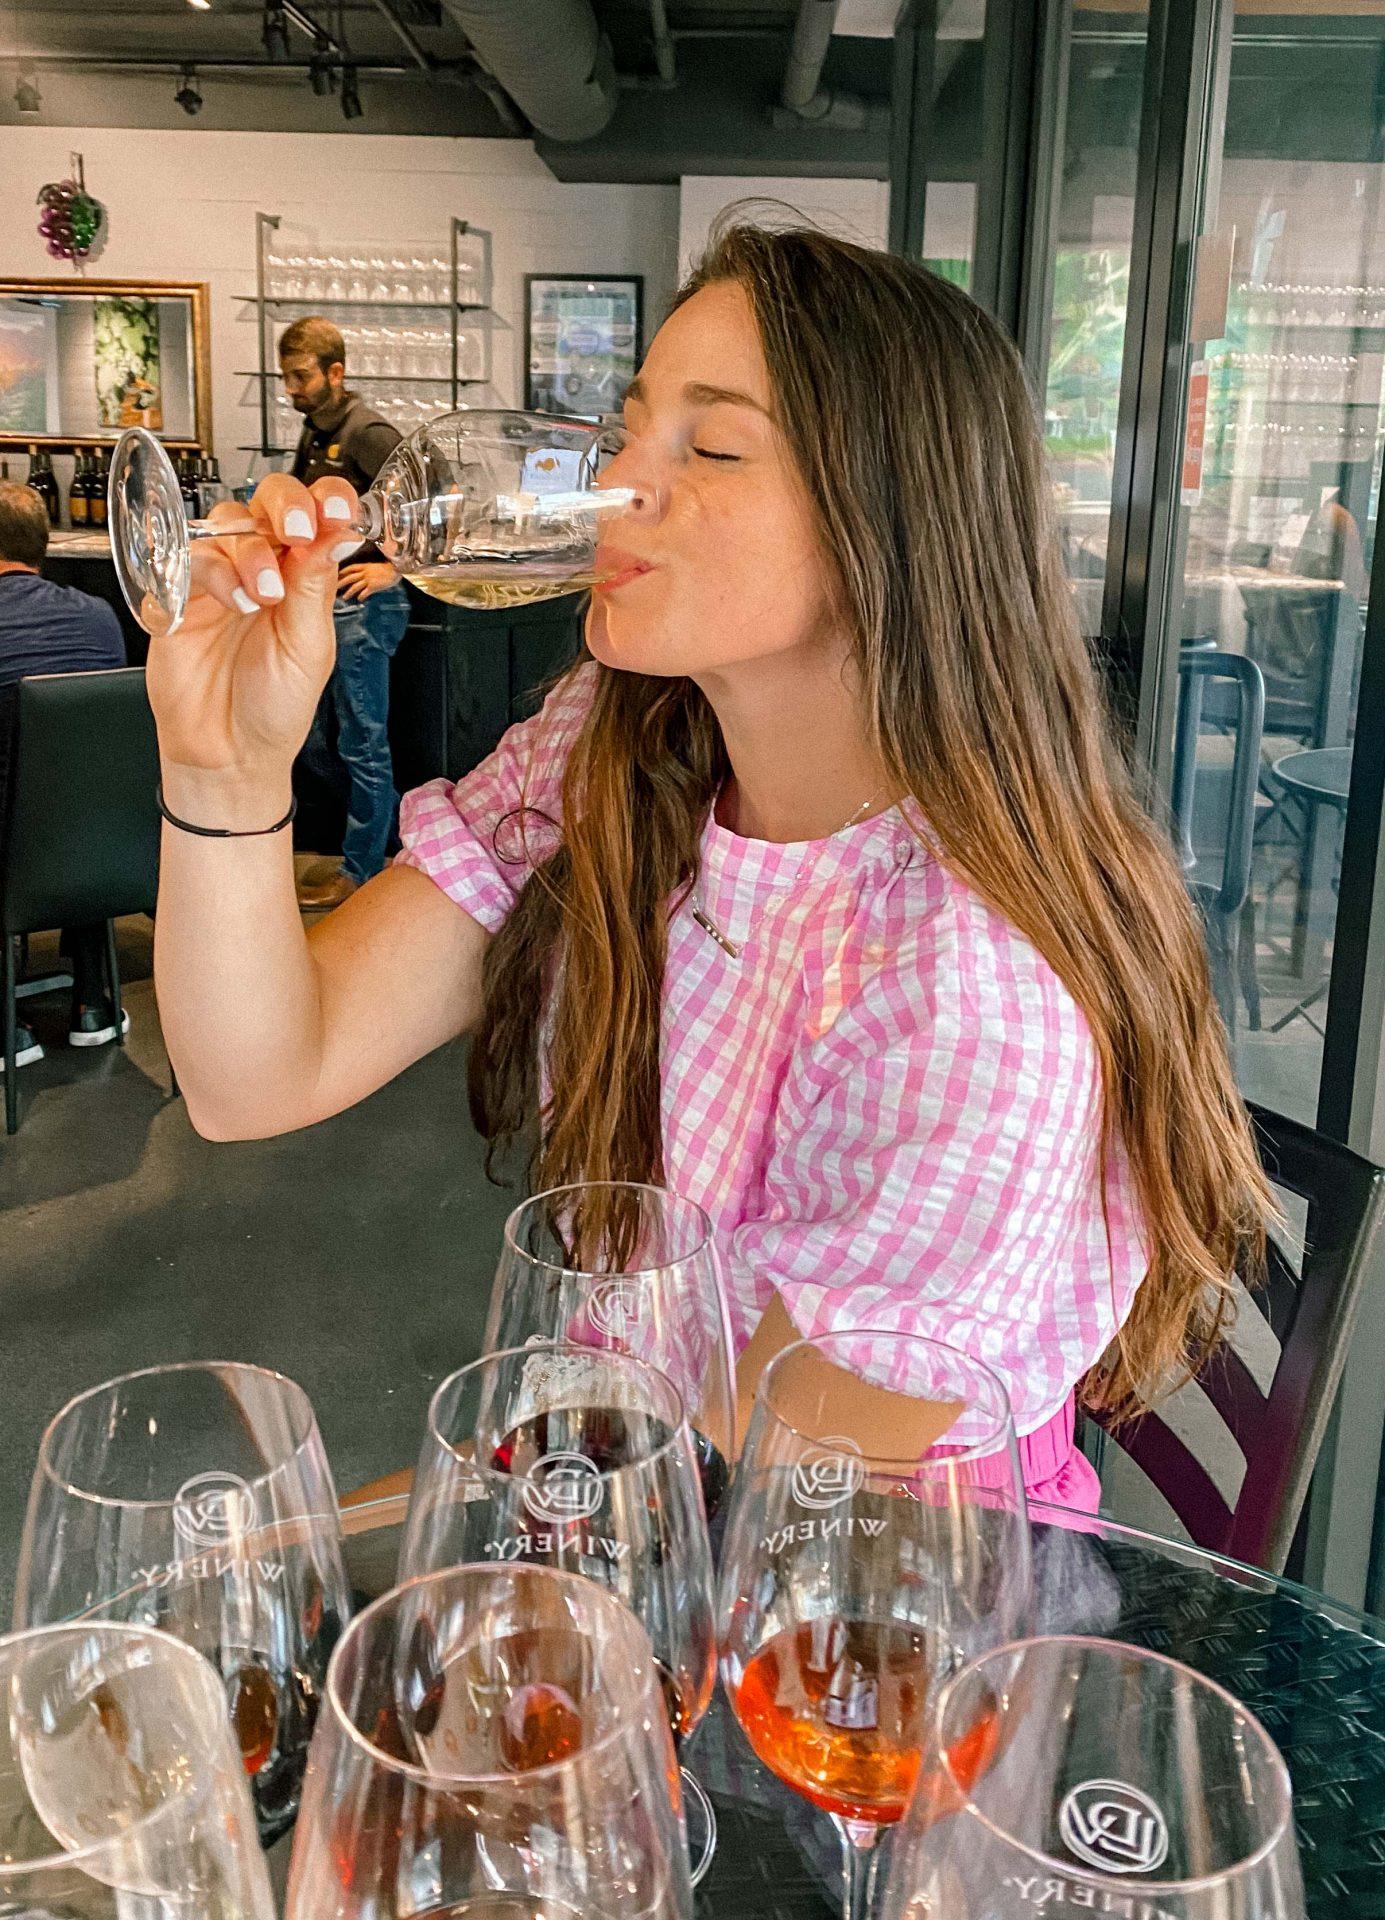 tasting room, wine tasting, LDV Winery, scottsdale, Arizona, scottsdale Arizona, travel Guide, blogger, what to do in scottsdale Arizona, winery, wine tasting, honeymoon, summer travel